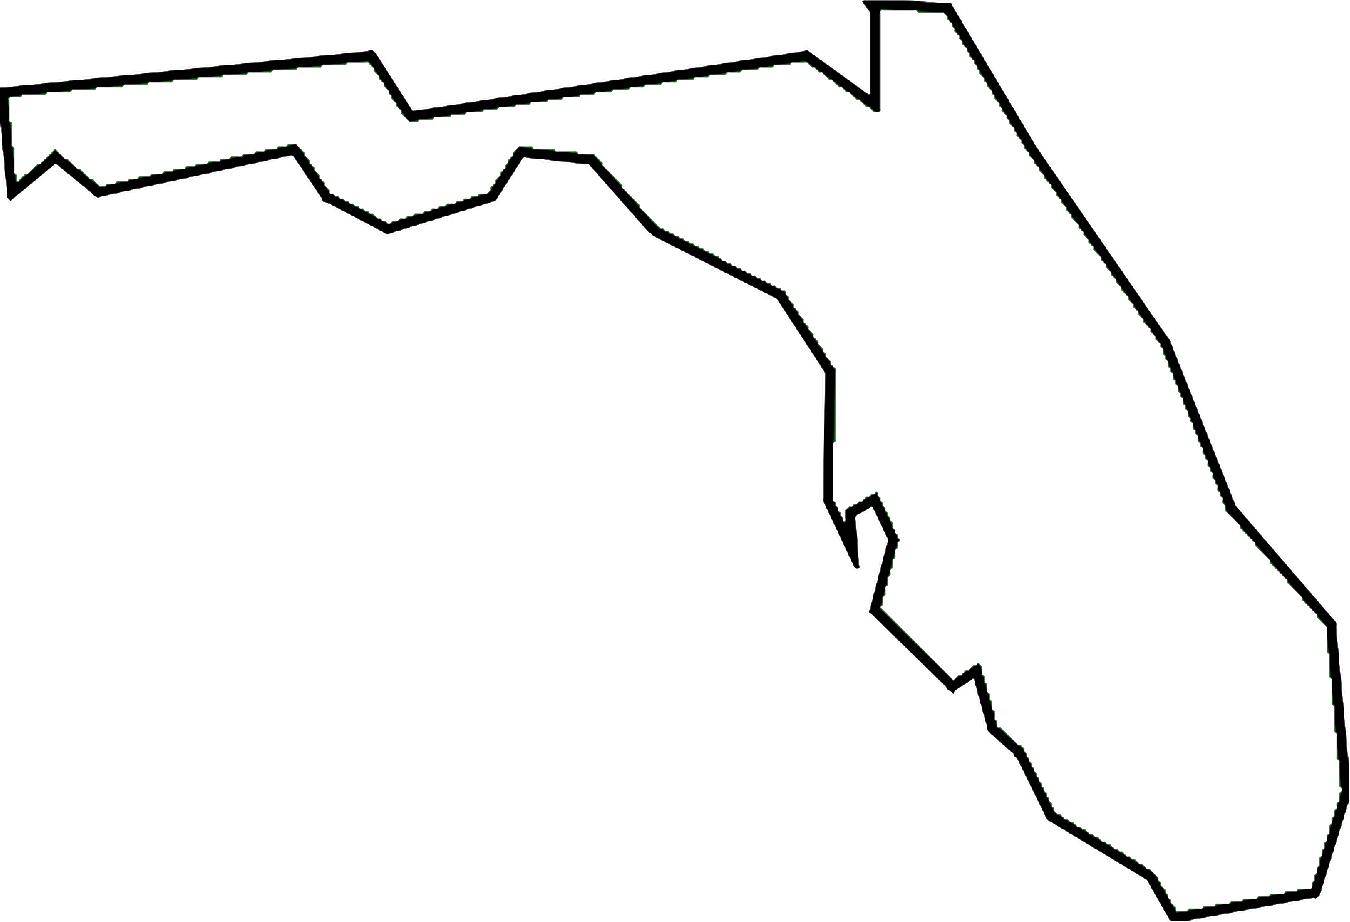 Clip Art Of State Fl : Florida outline clipart best